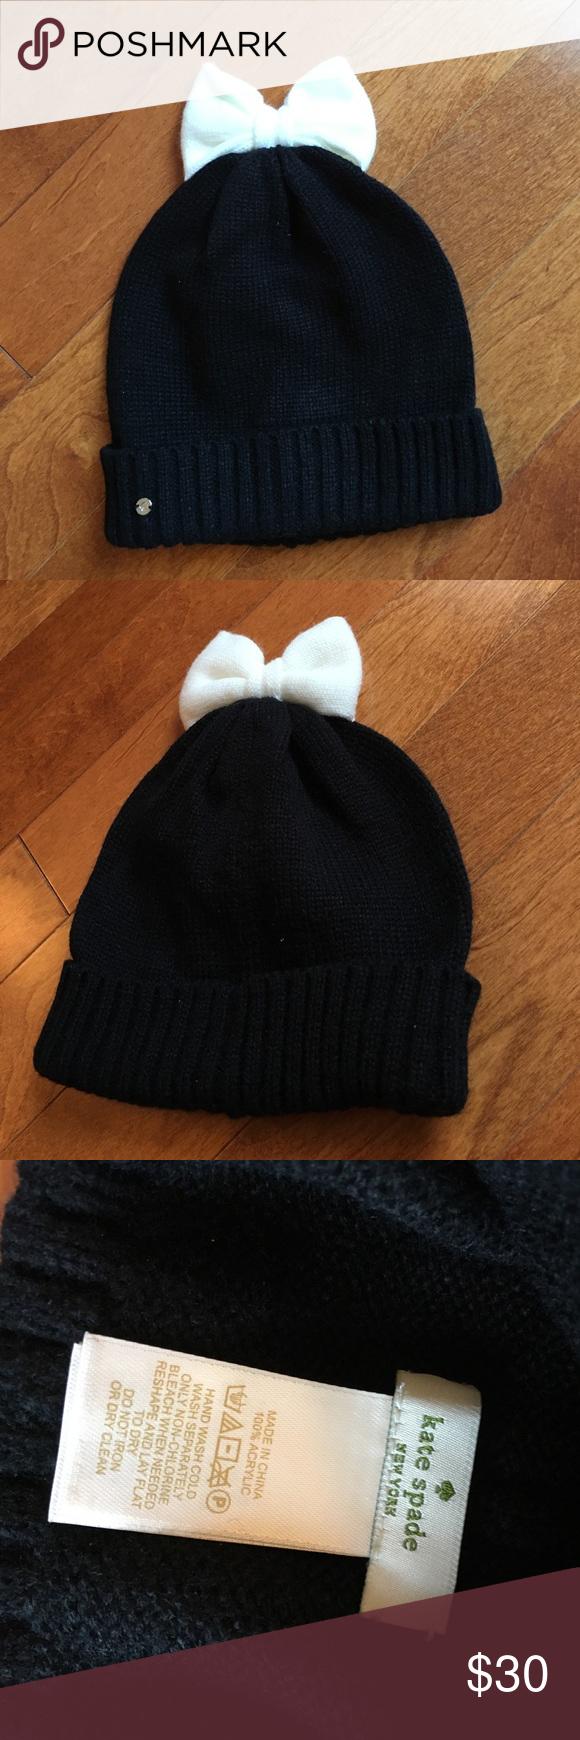 d482fbeea62a6e NWOT Kate Spade Bow beanie NWOT colorblock bow beanie kate spade Accessories  Hats